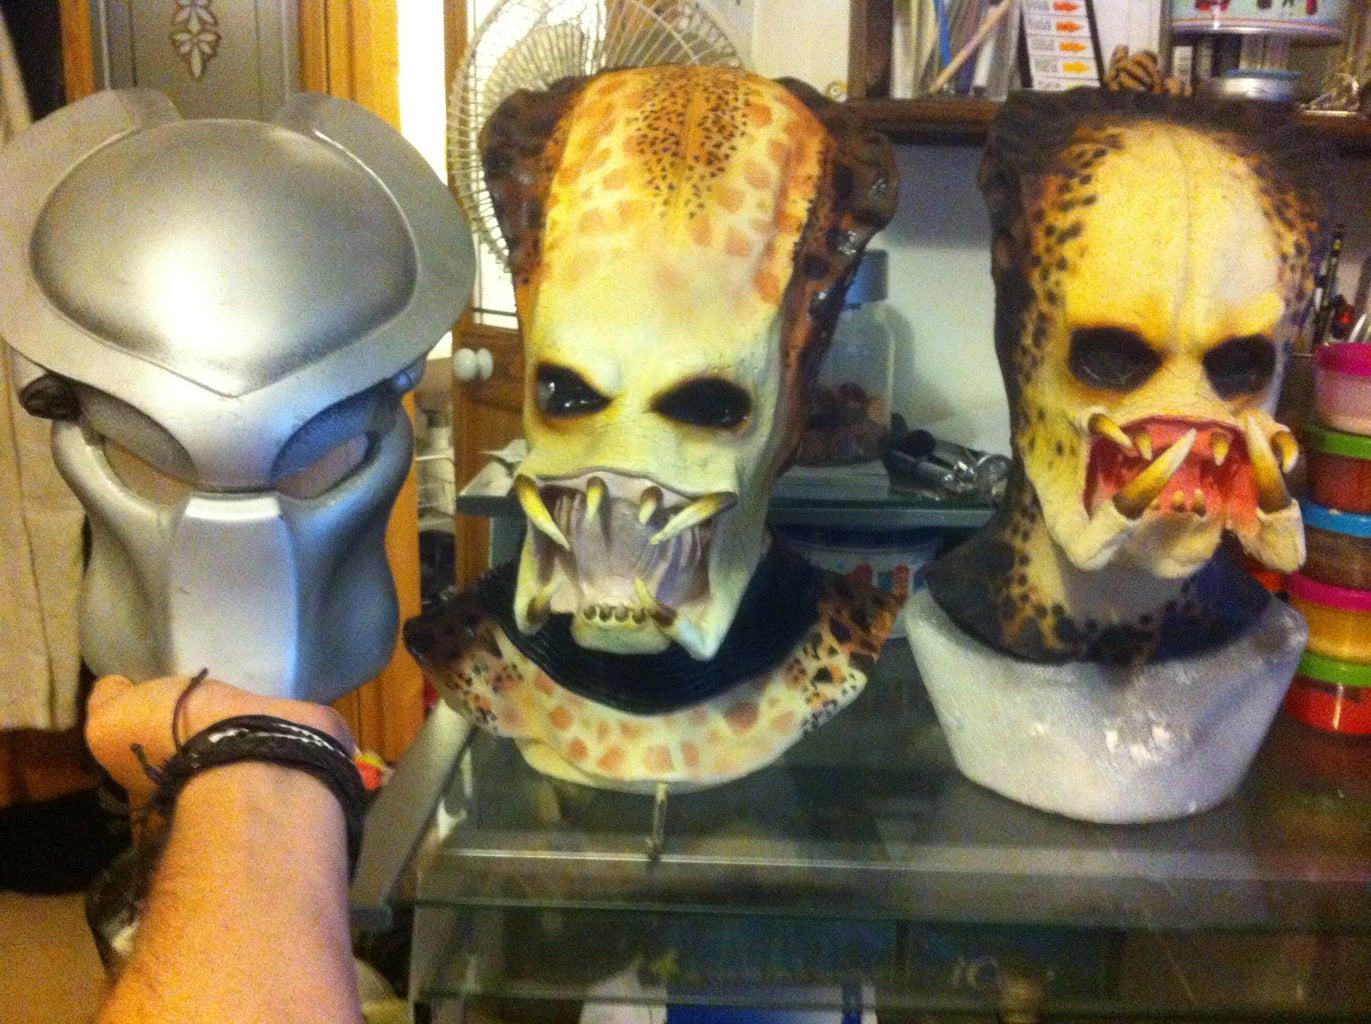 Predator Mask Mark 2 - 2 Part Plaster Mold for a Latex Mask